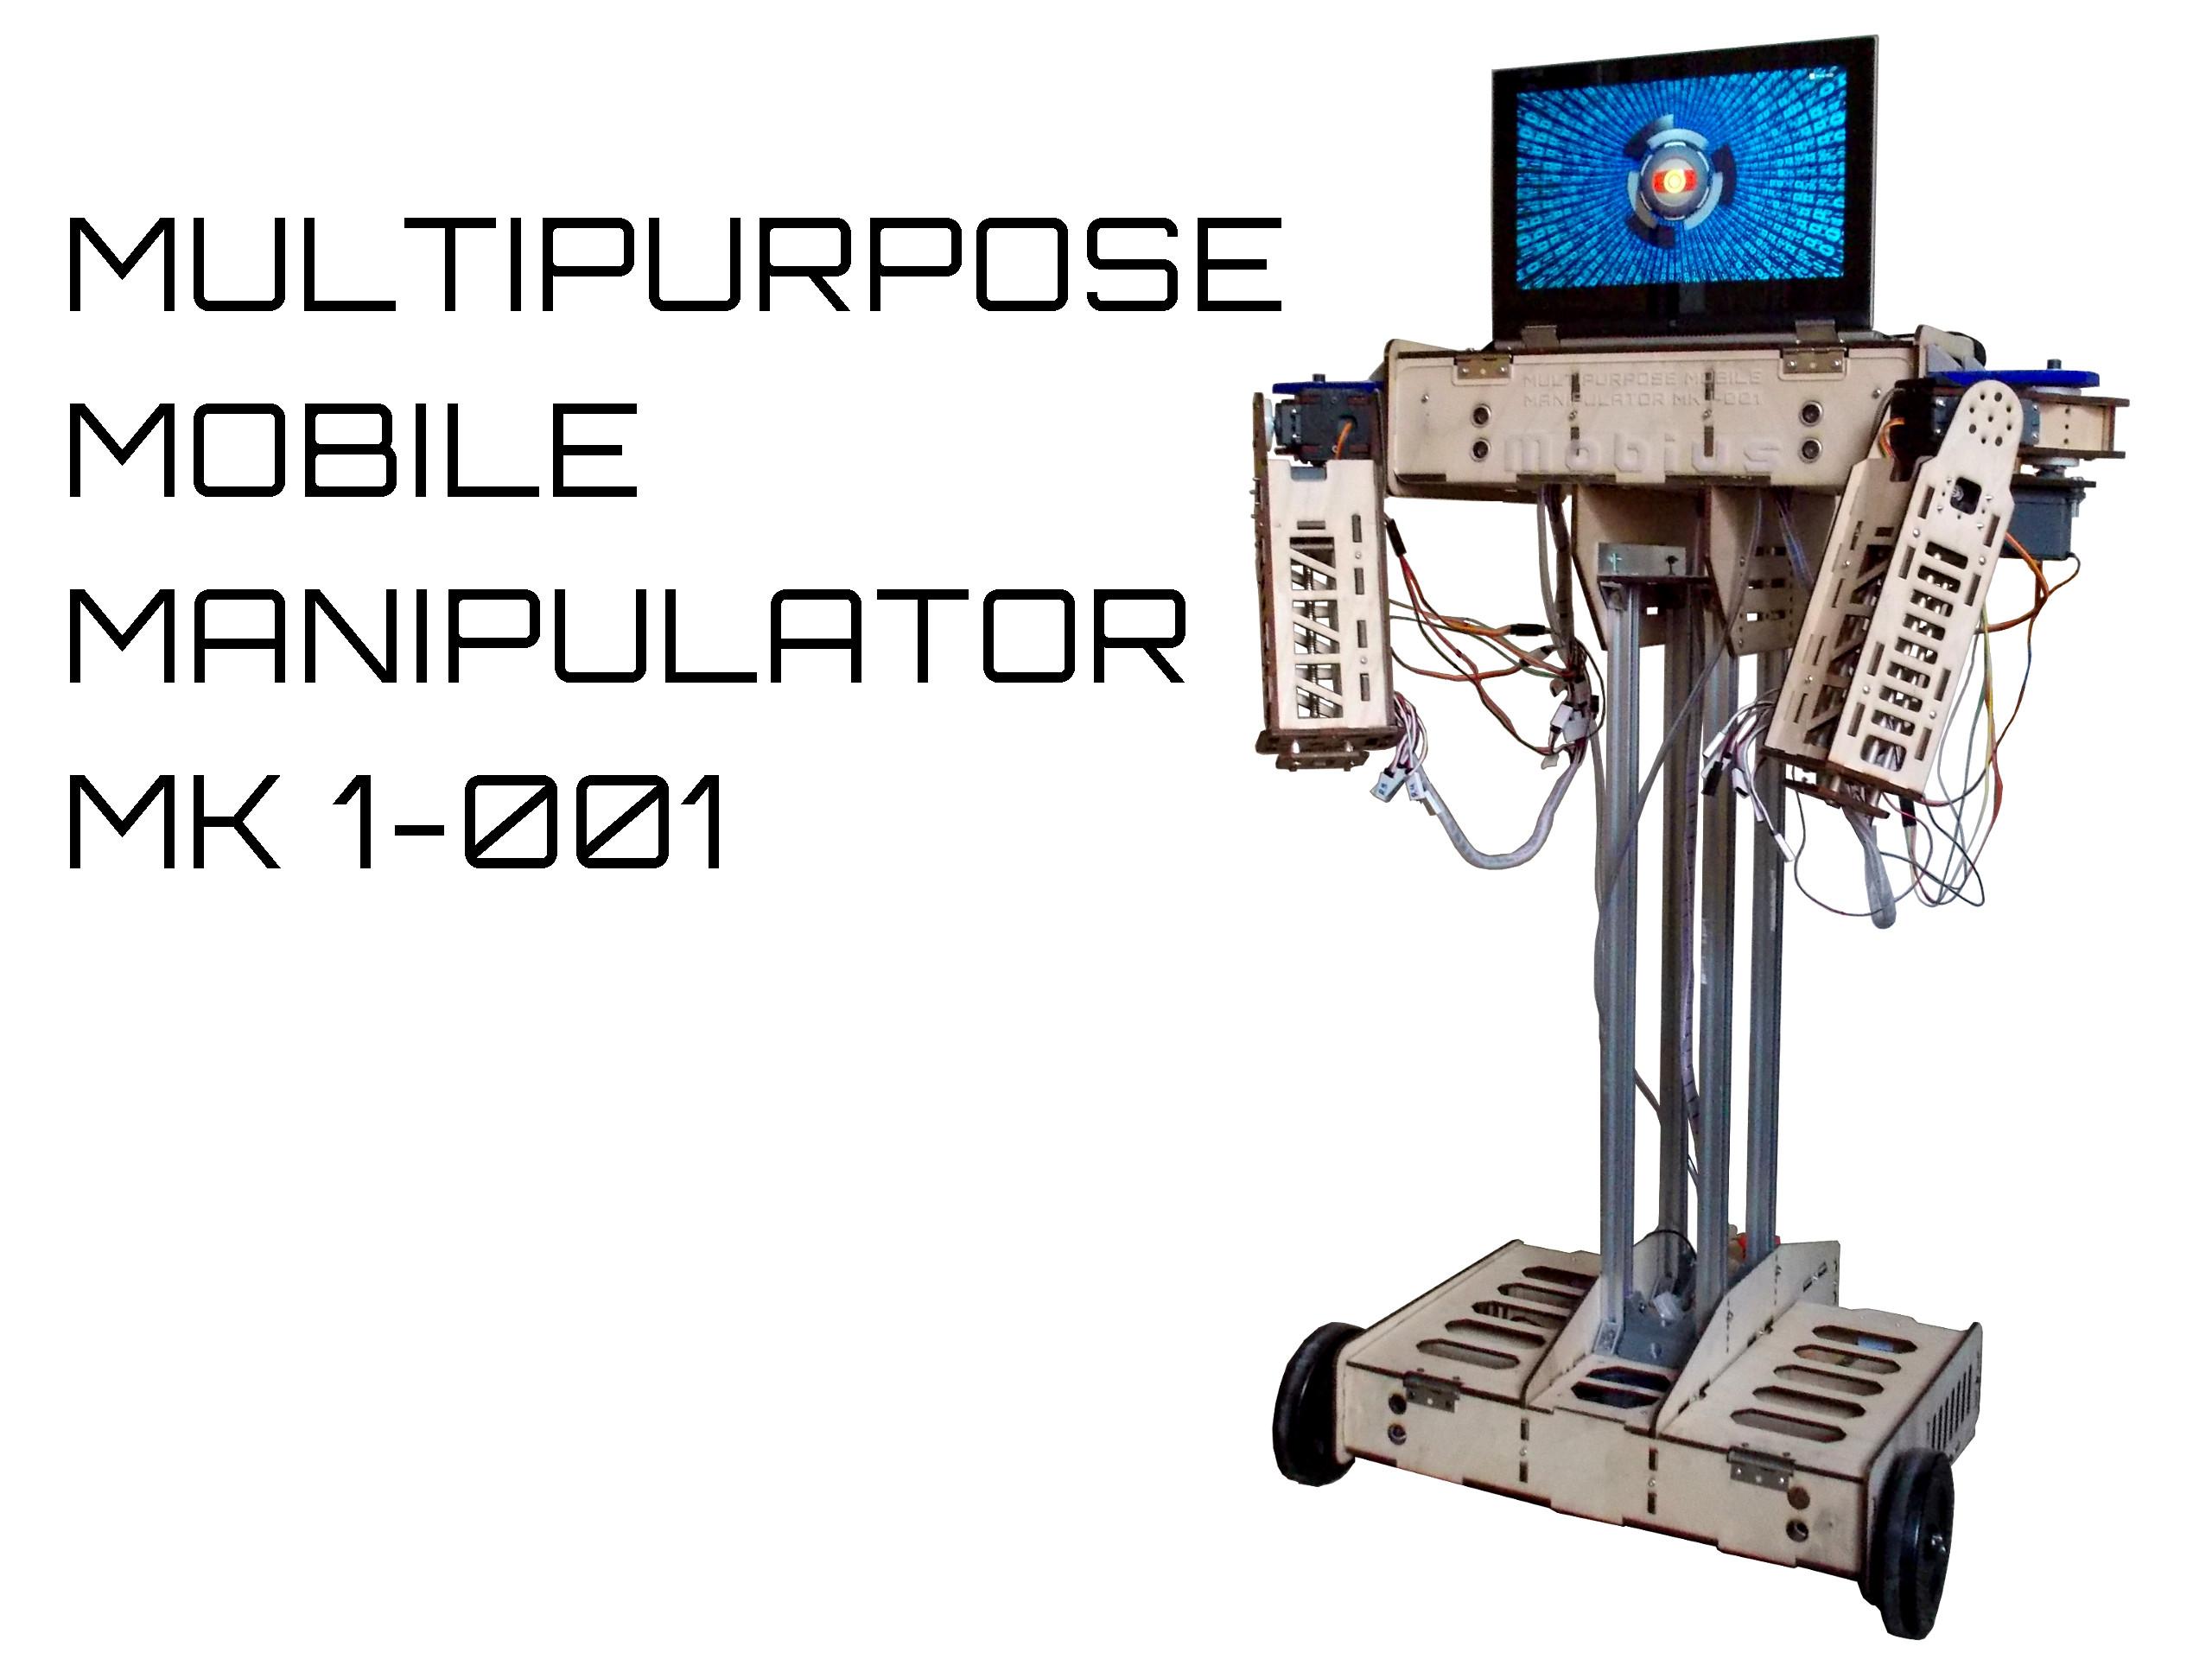 Picture of Multipurpose Mobile Manipulator Mk 1